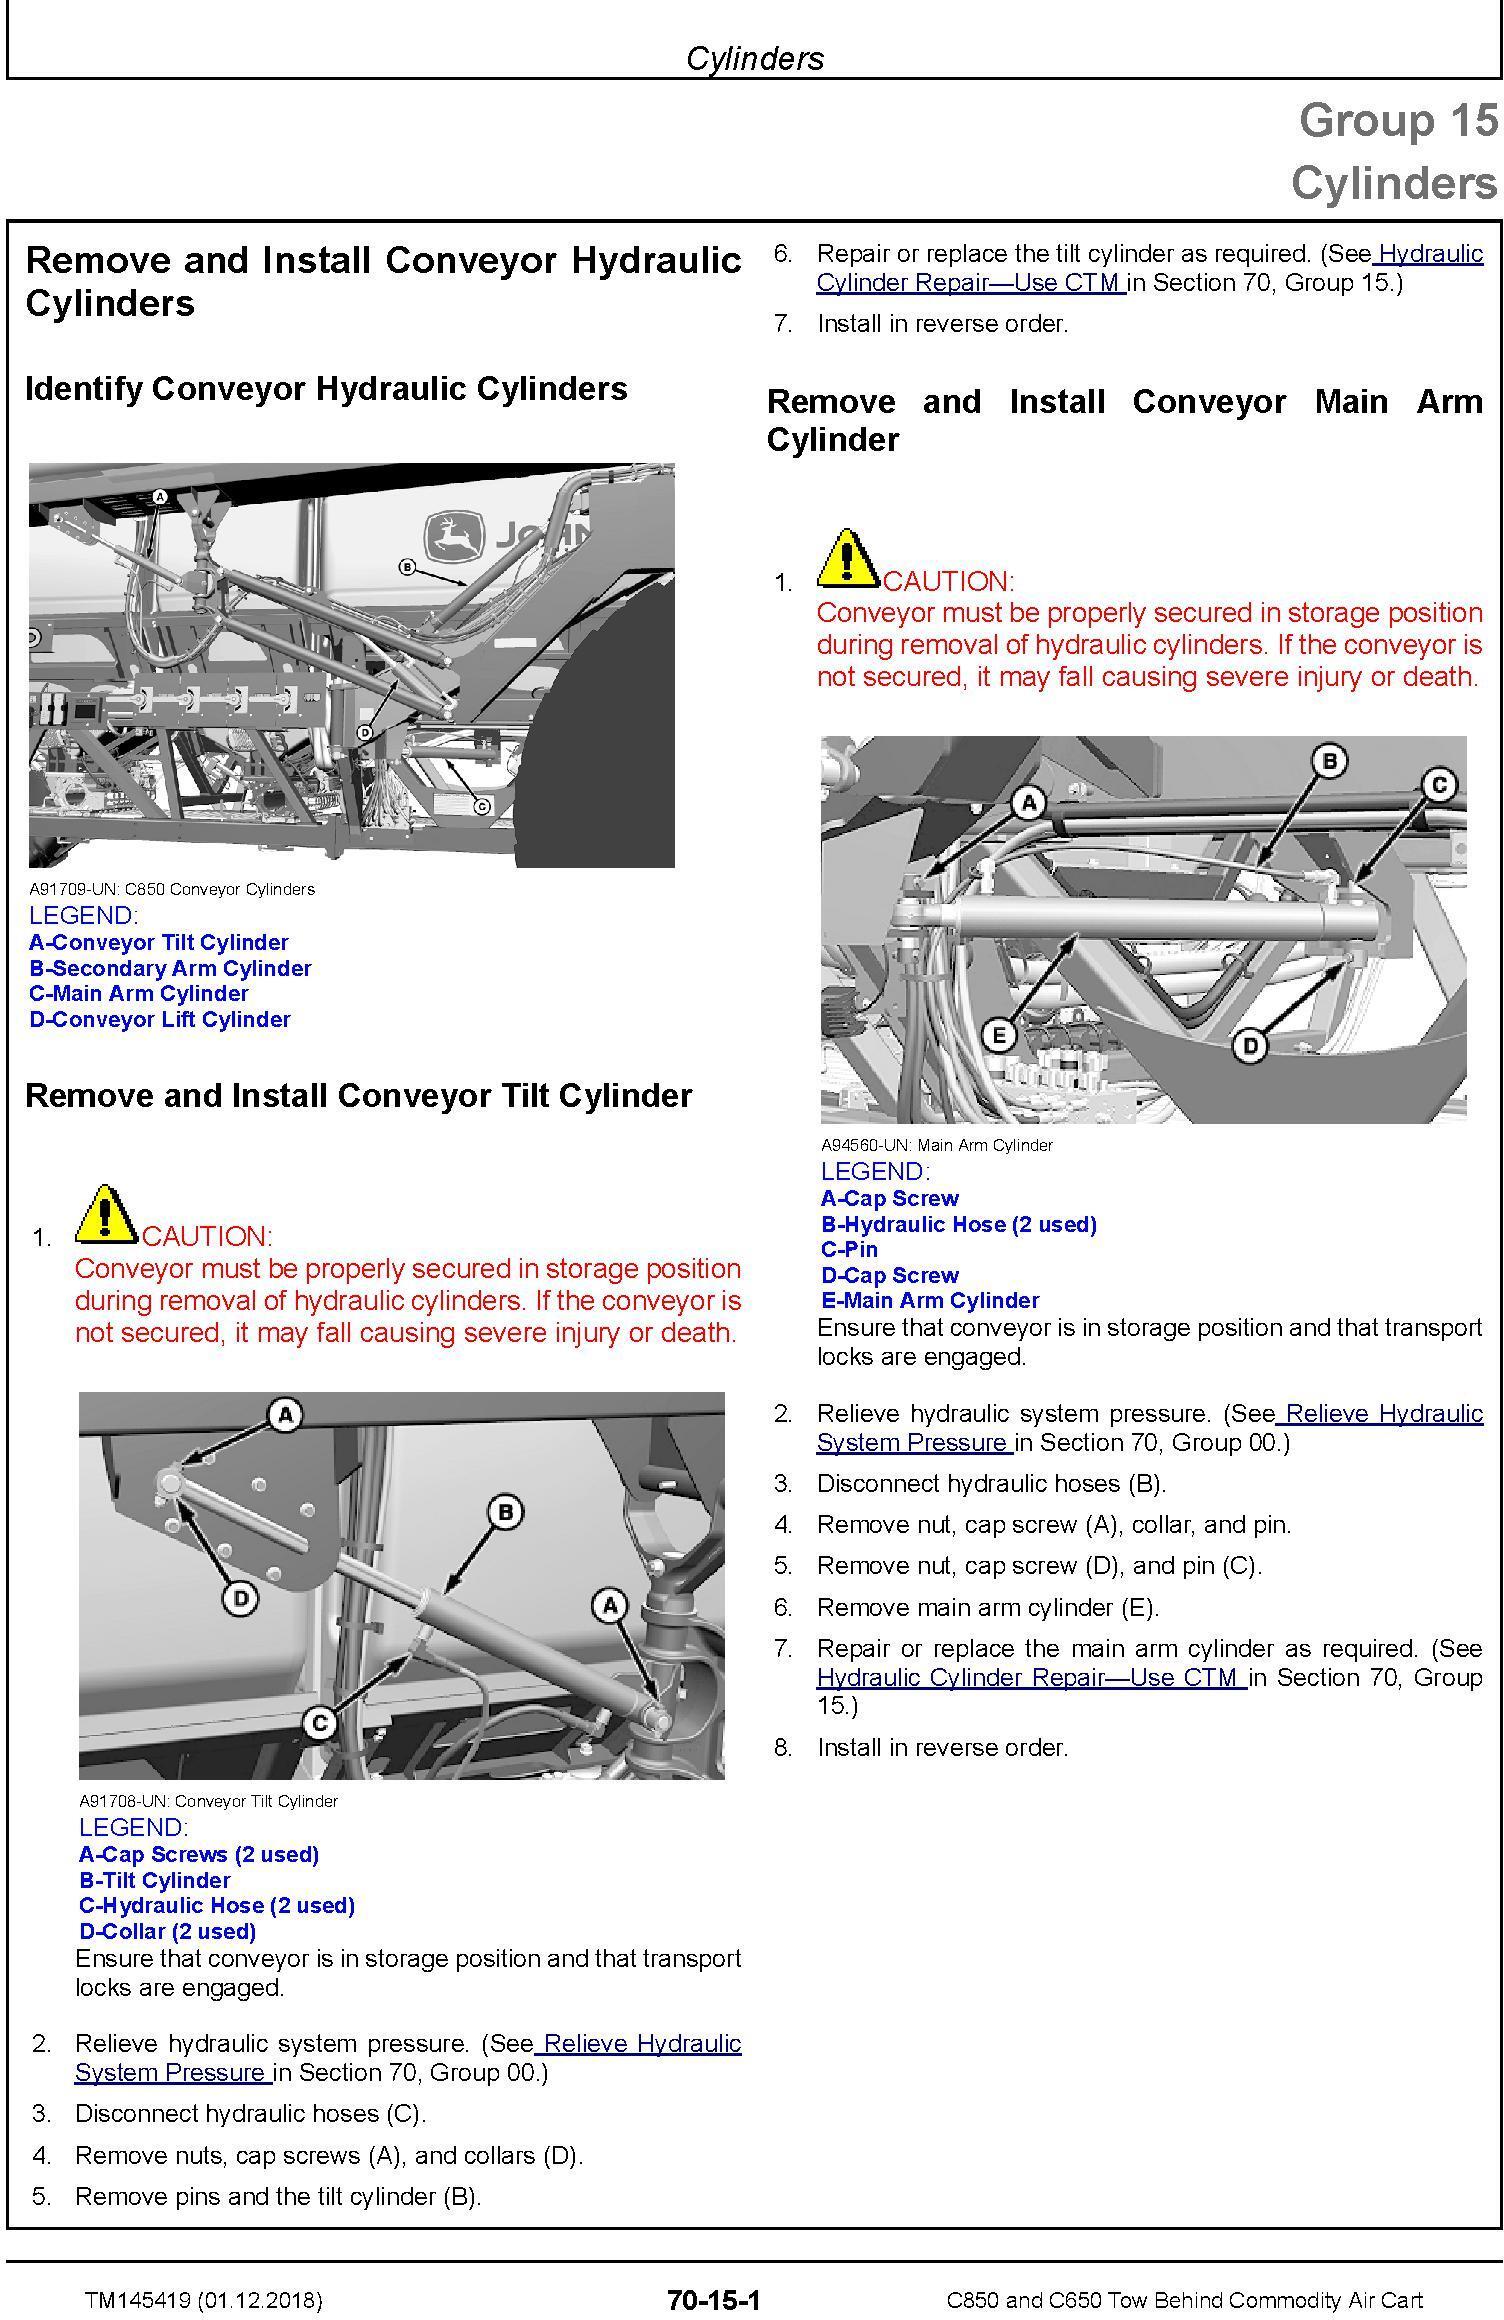 John Deere C850 and C650 Tow Behind Commodity Air Cart Repair Technical Service Manual (TM145419) - 2